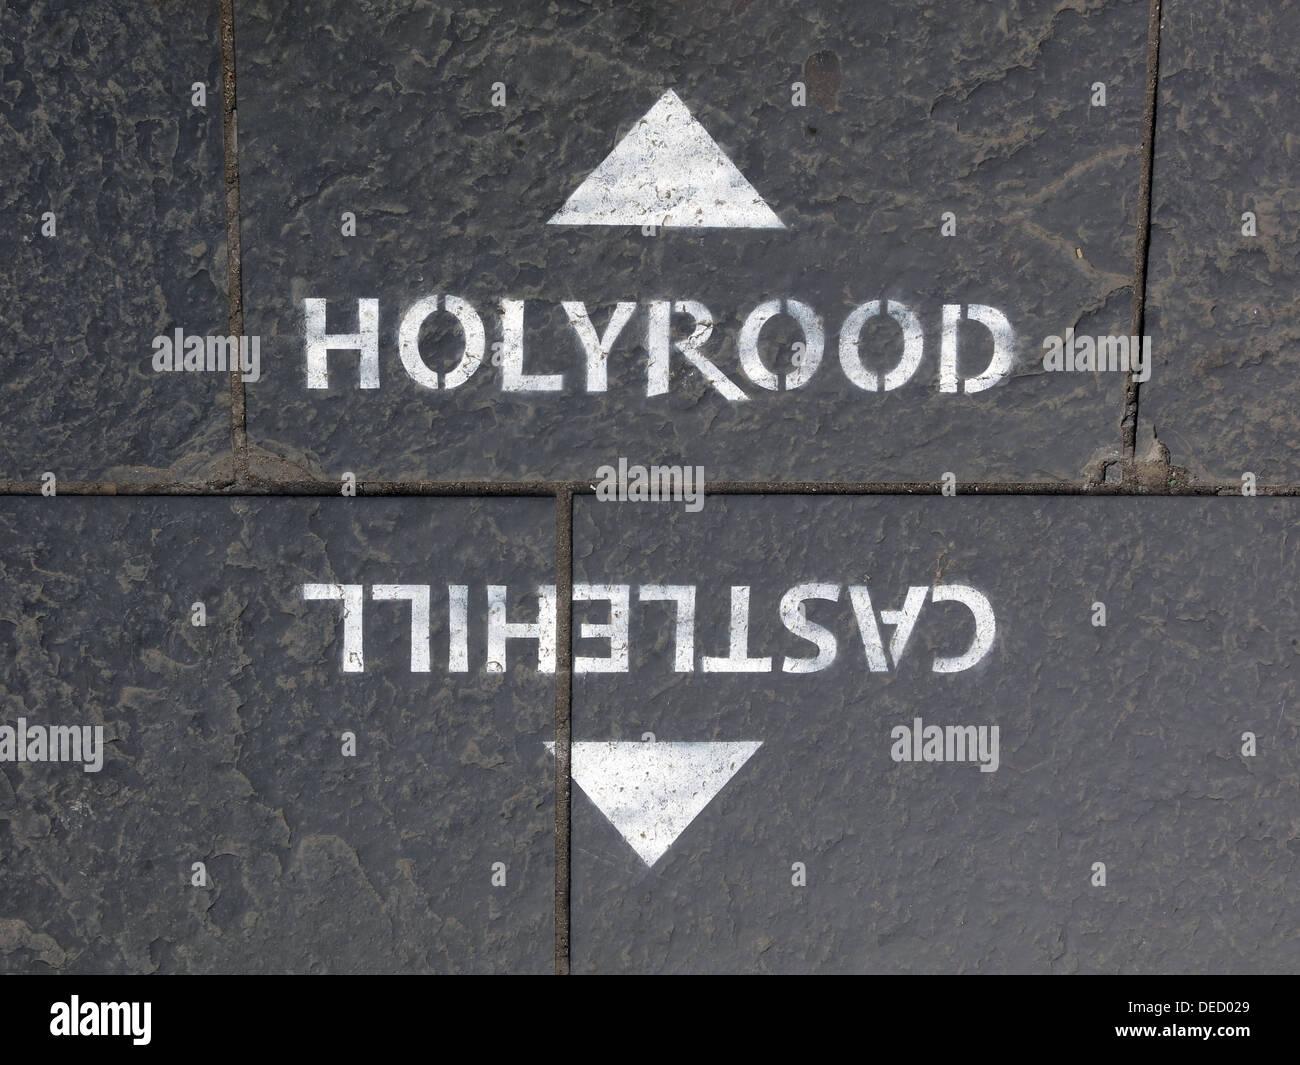 Pavement Sign for Holyrood Castlehill  High St Royal Mile Edinburgh Scotland UK - Stock Image